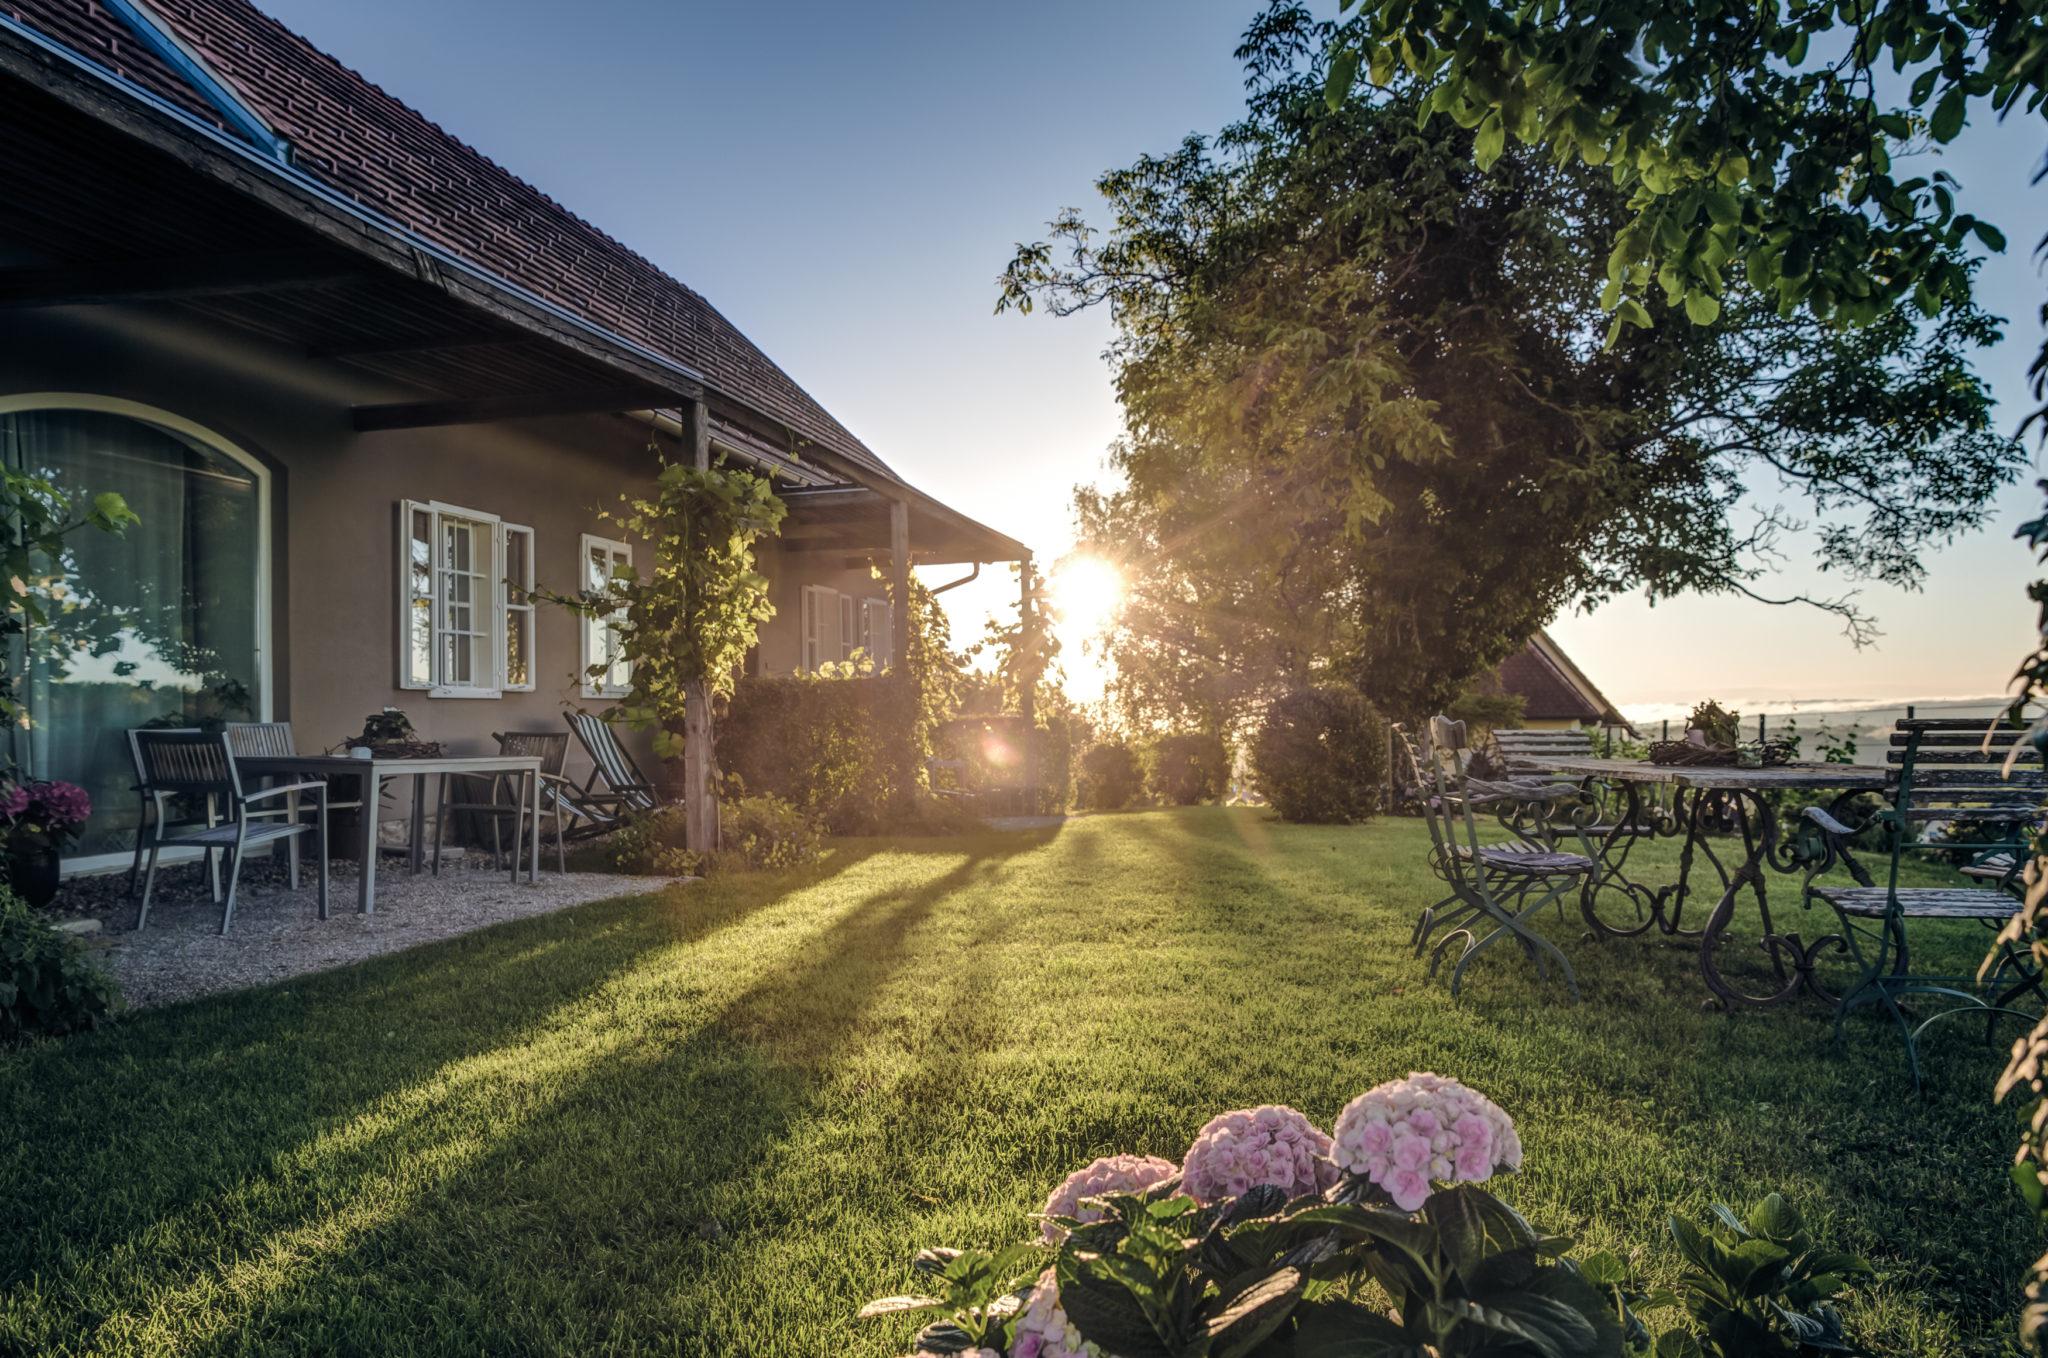 Sonnenaufgang in Zieregg - Winzarei Weingut Tement